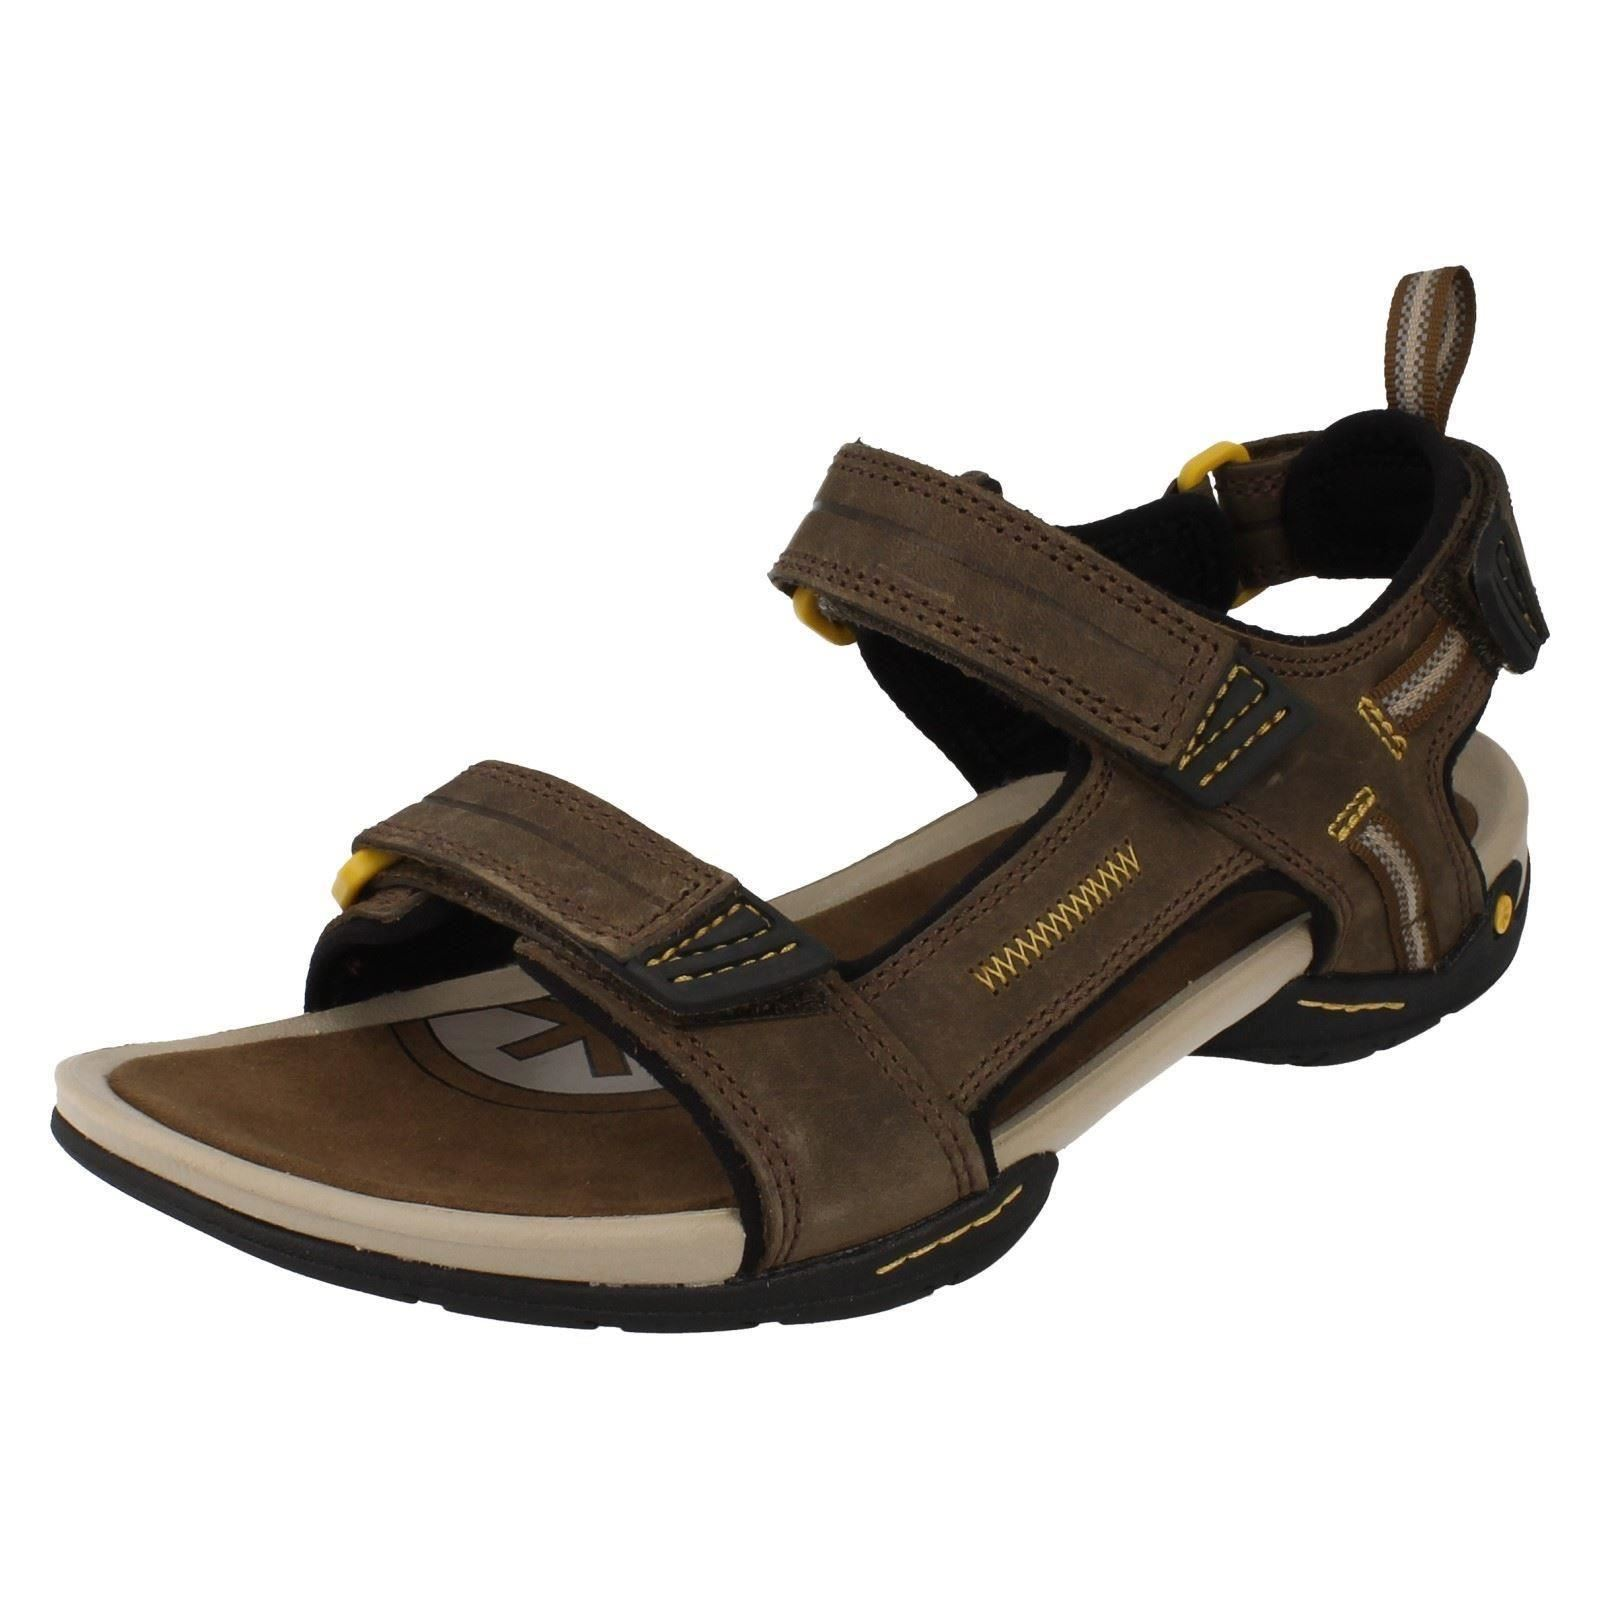 a4ea9e2858f27d Clarks Mens Brown Double Strap Sandals From Debenhams UK 10 8113217 ...